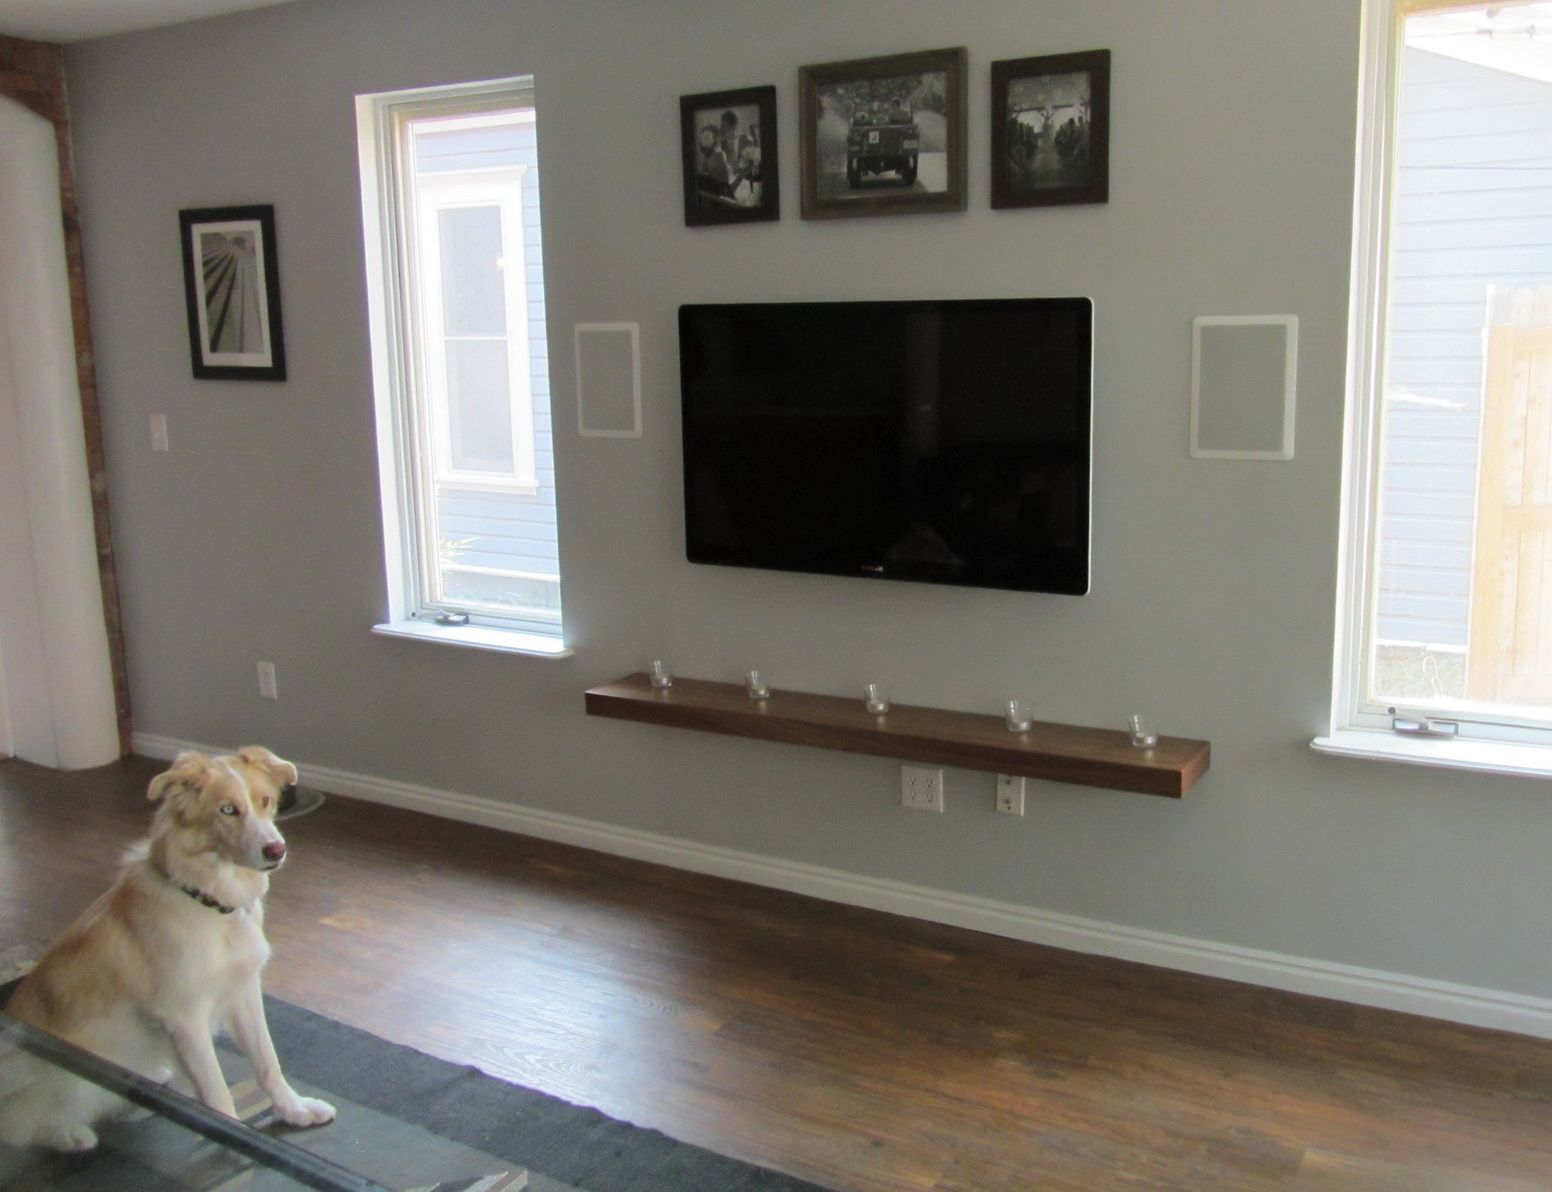 Wall Mounted Shelves For Electronics | Wall Mounted Shelves ...